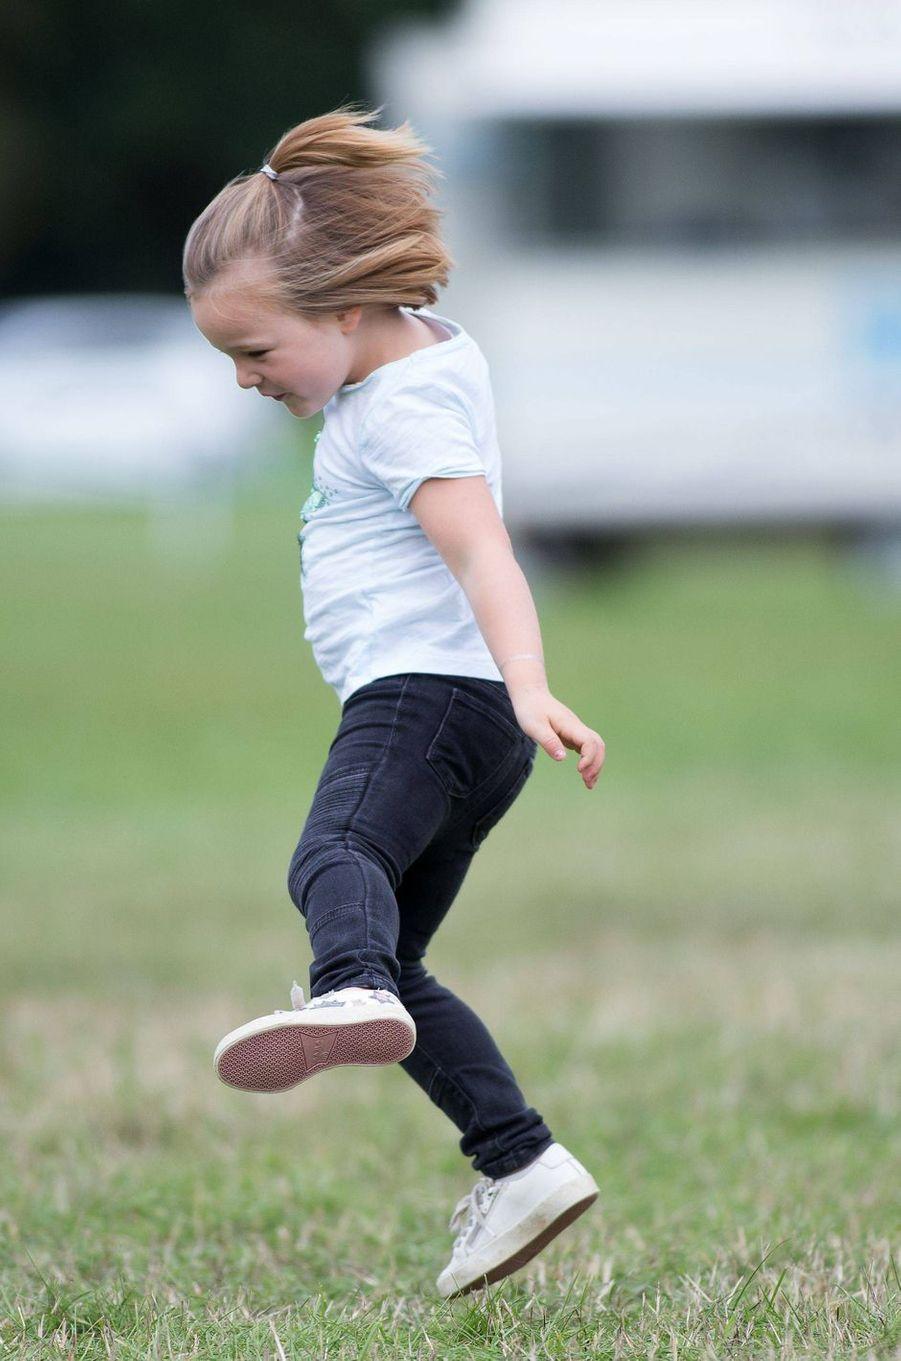 Mia Tindall à Gatcombe Park, le 9 septembre 2018